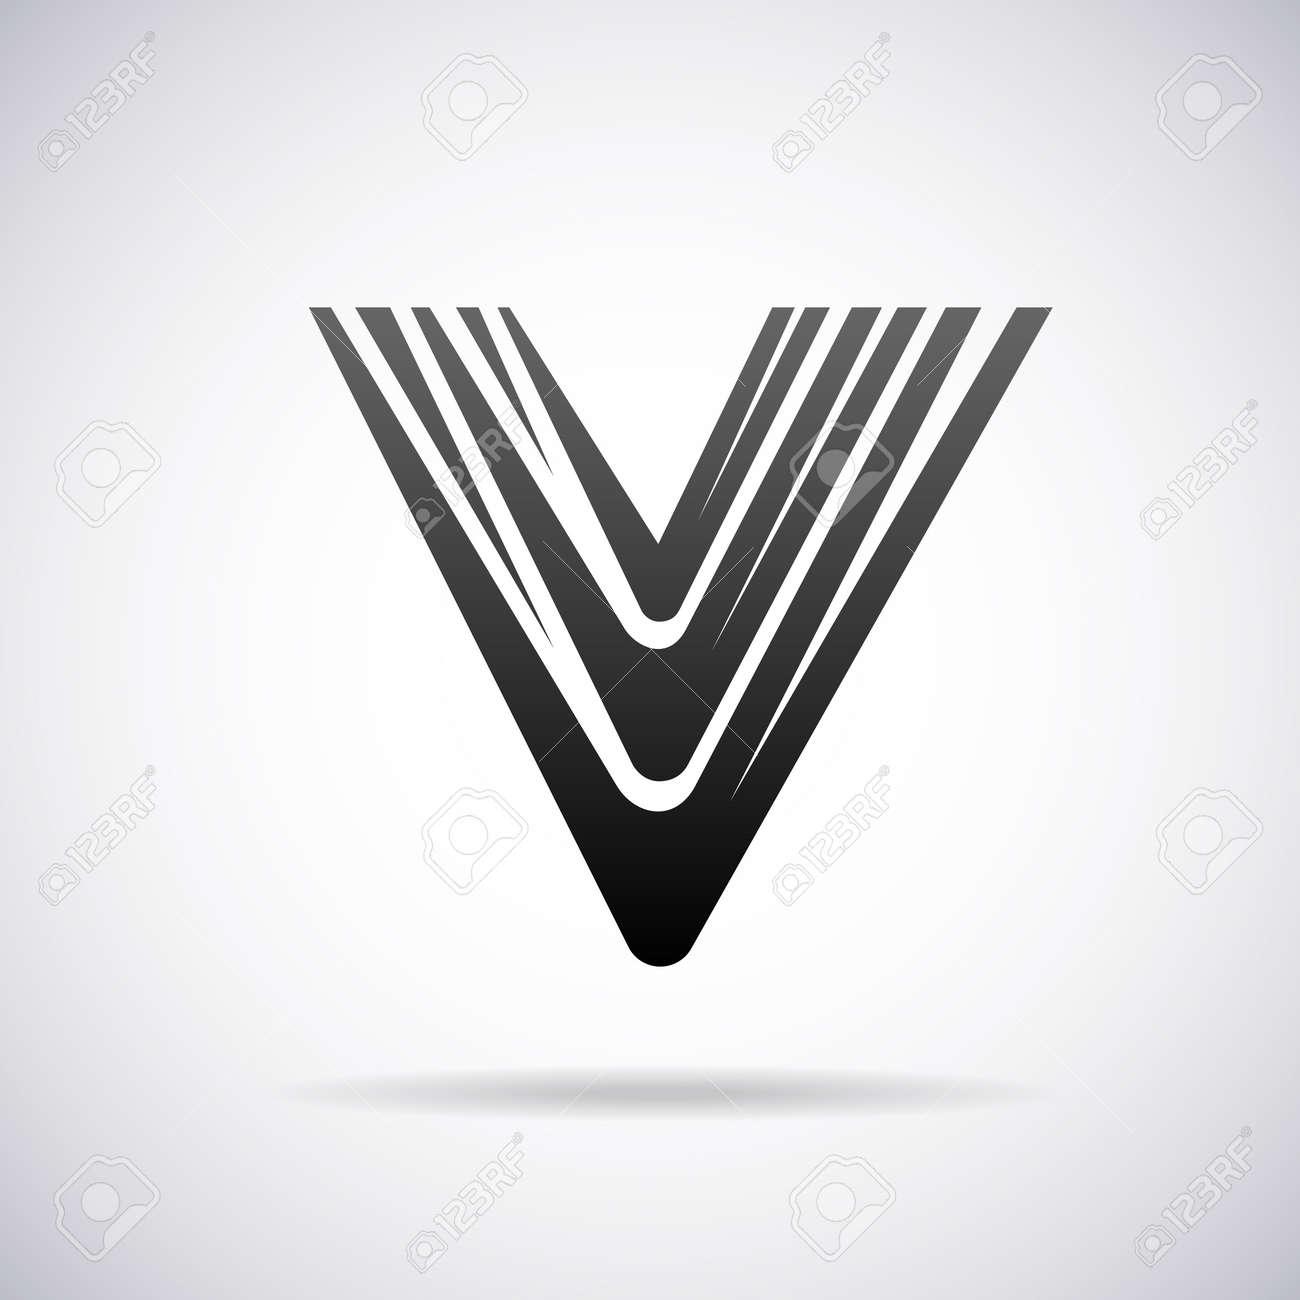 letter v design template vector illustration royalty free cliparts